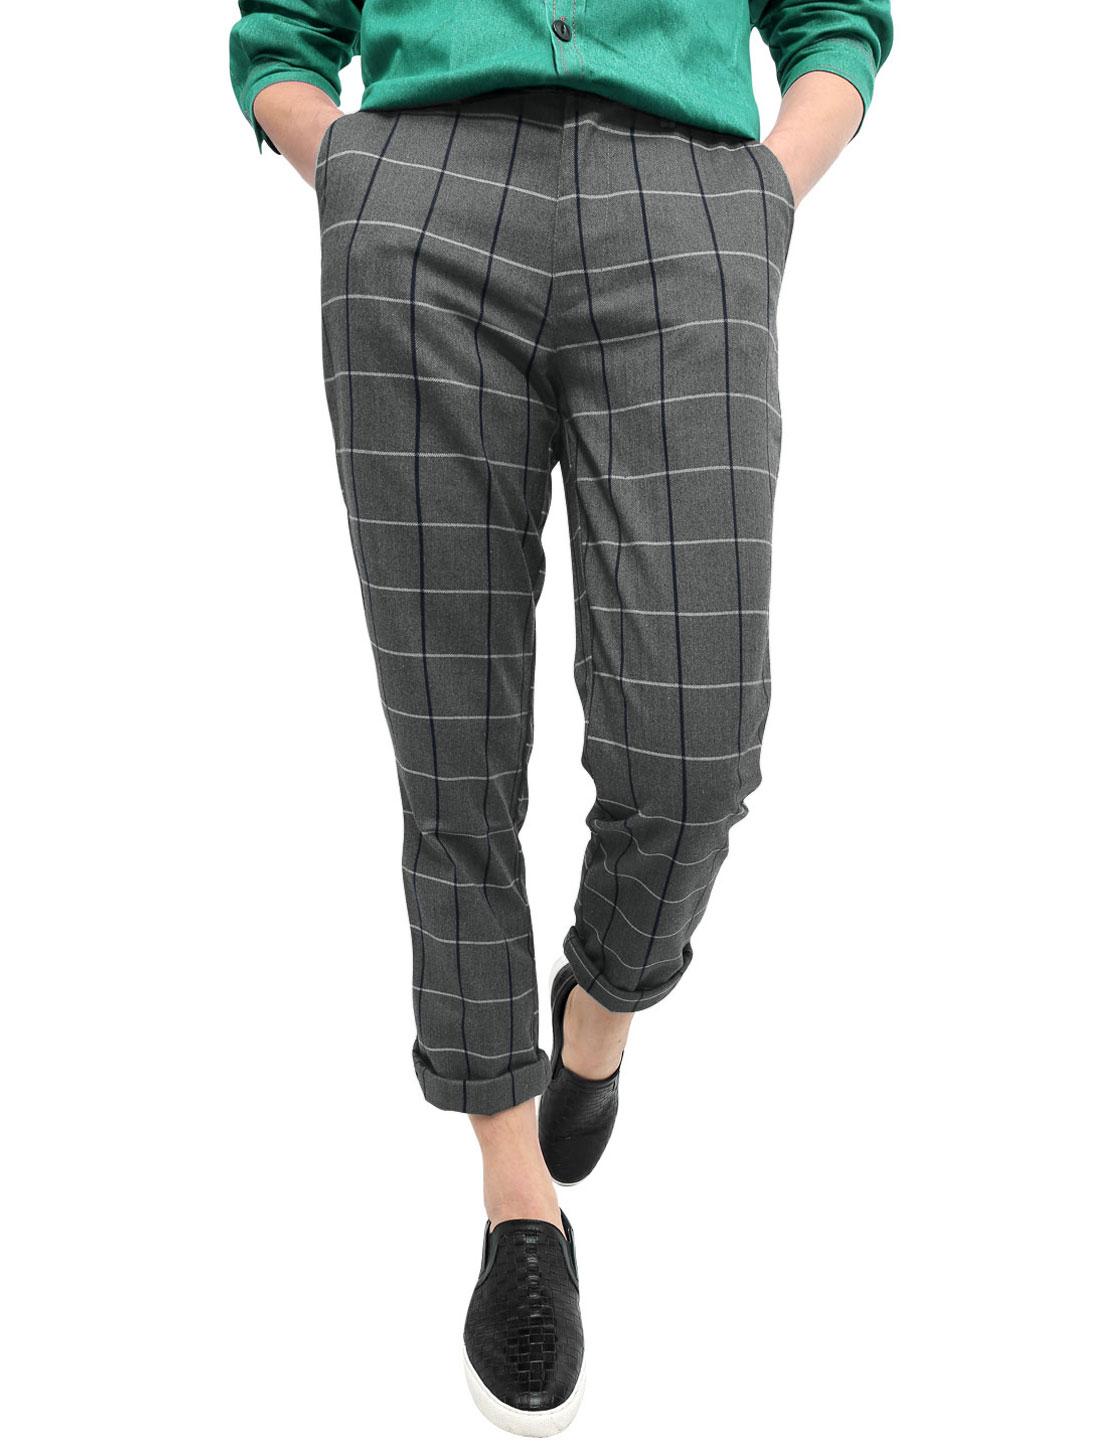 Men Checks Print Front Pockets Slim Fit Chino Pants Dark Gray W32